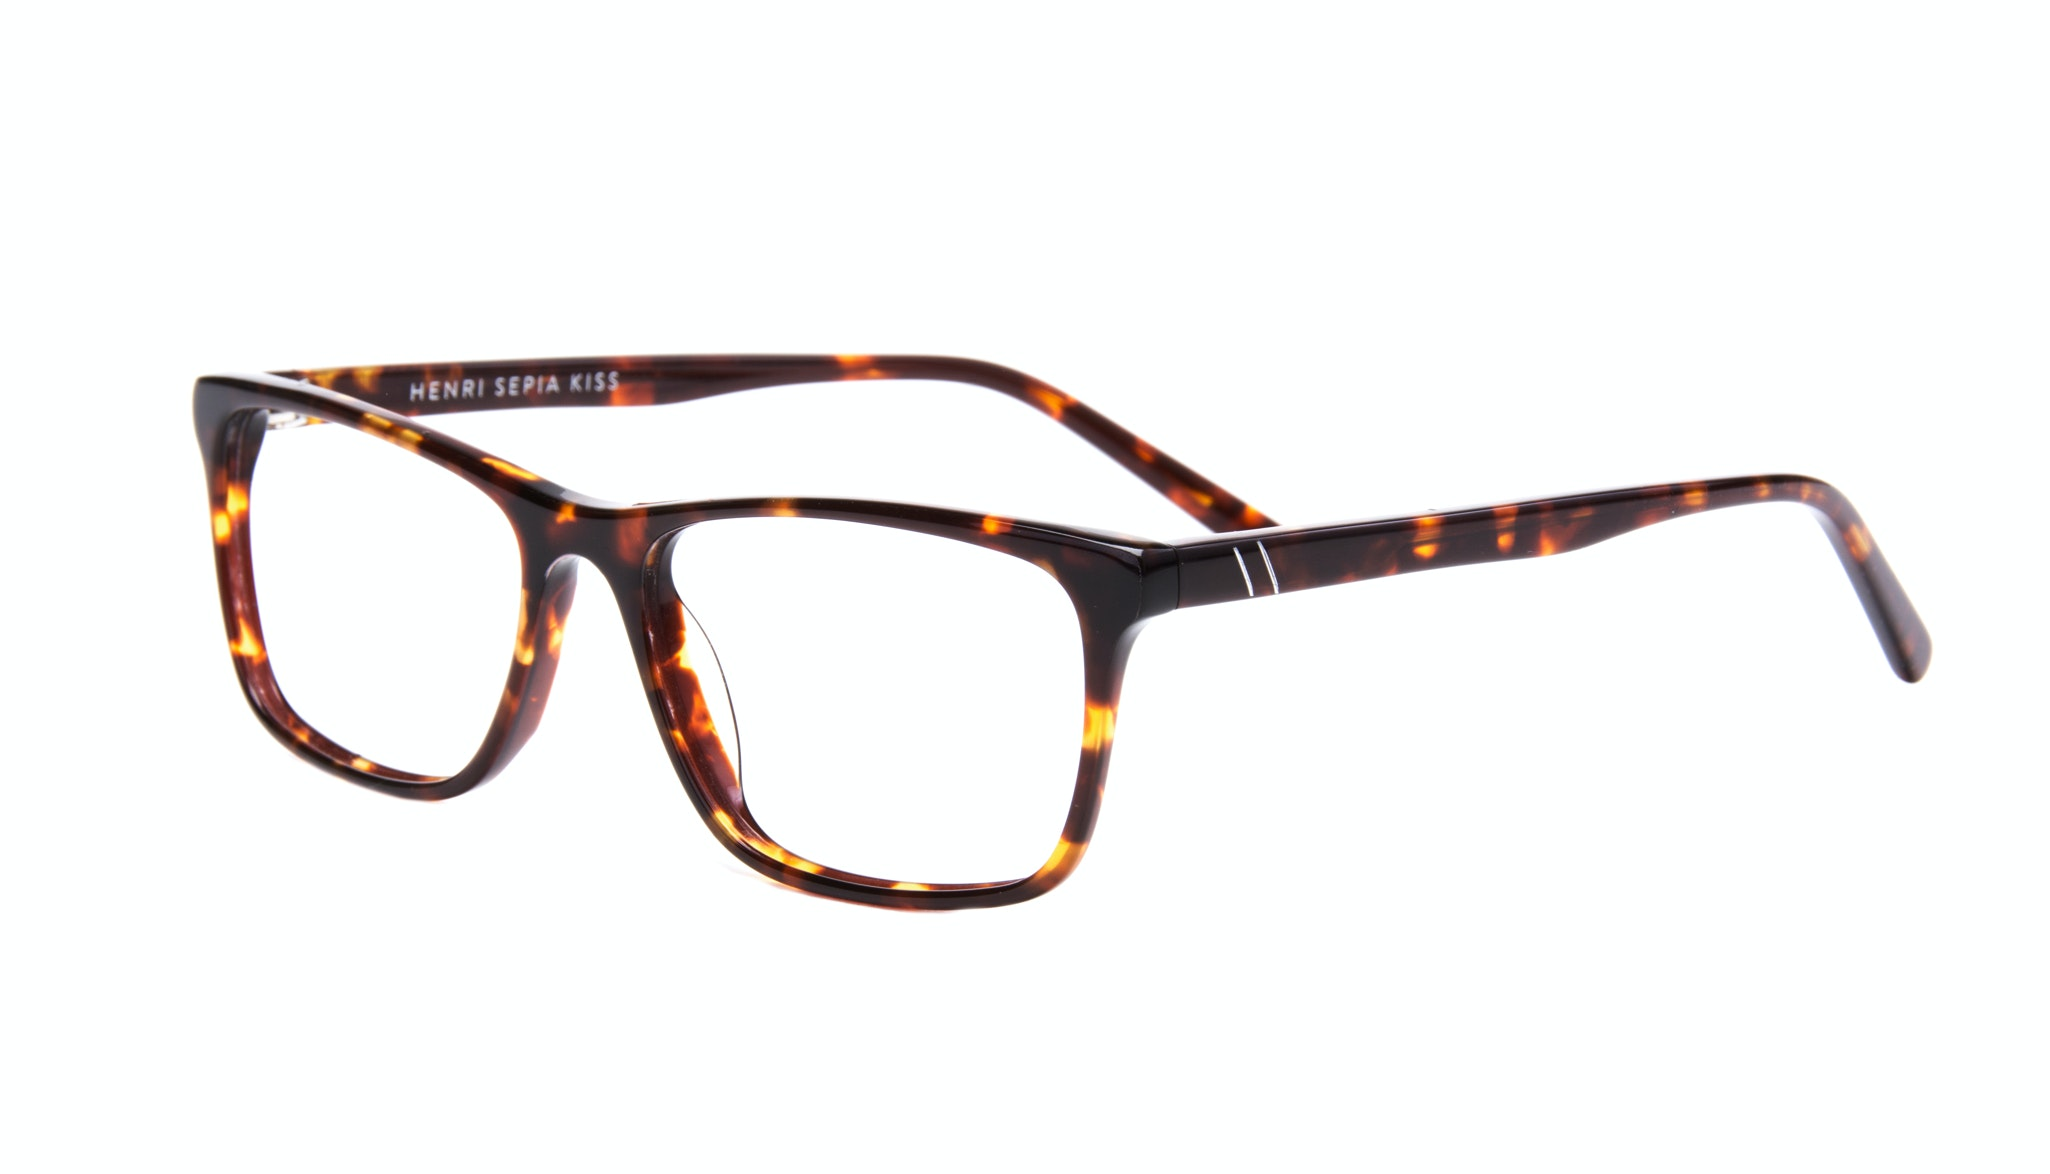 Affordable Fashion Glasses Rectangle Eyeglasses Men Henri Sepia Kiss Tilt